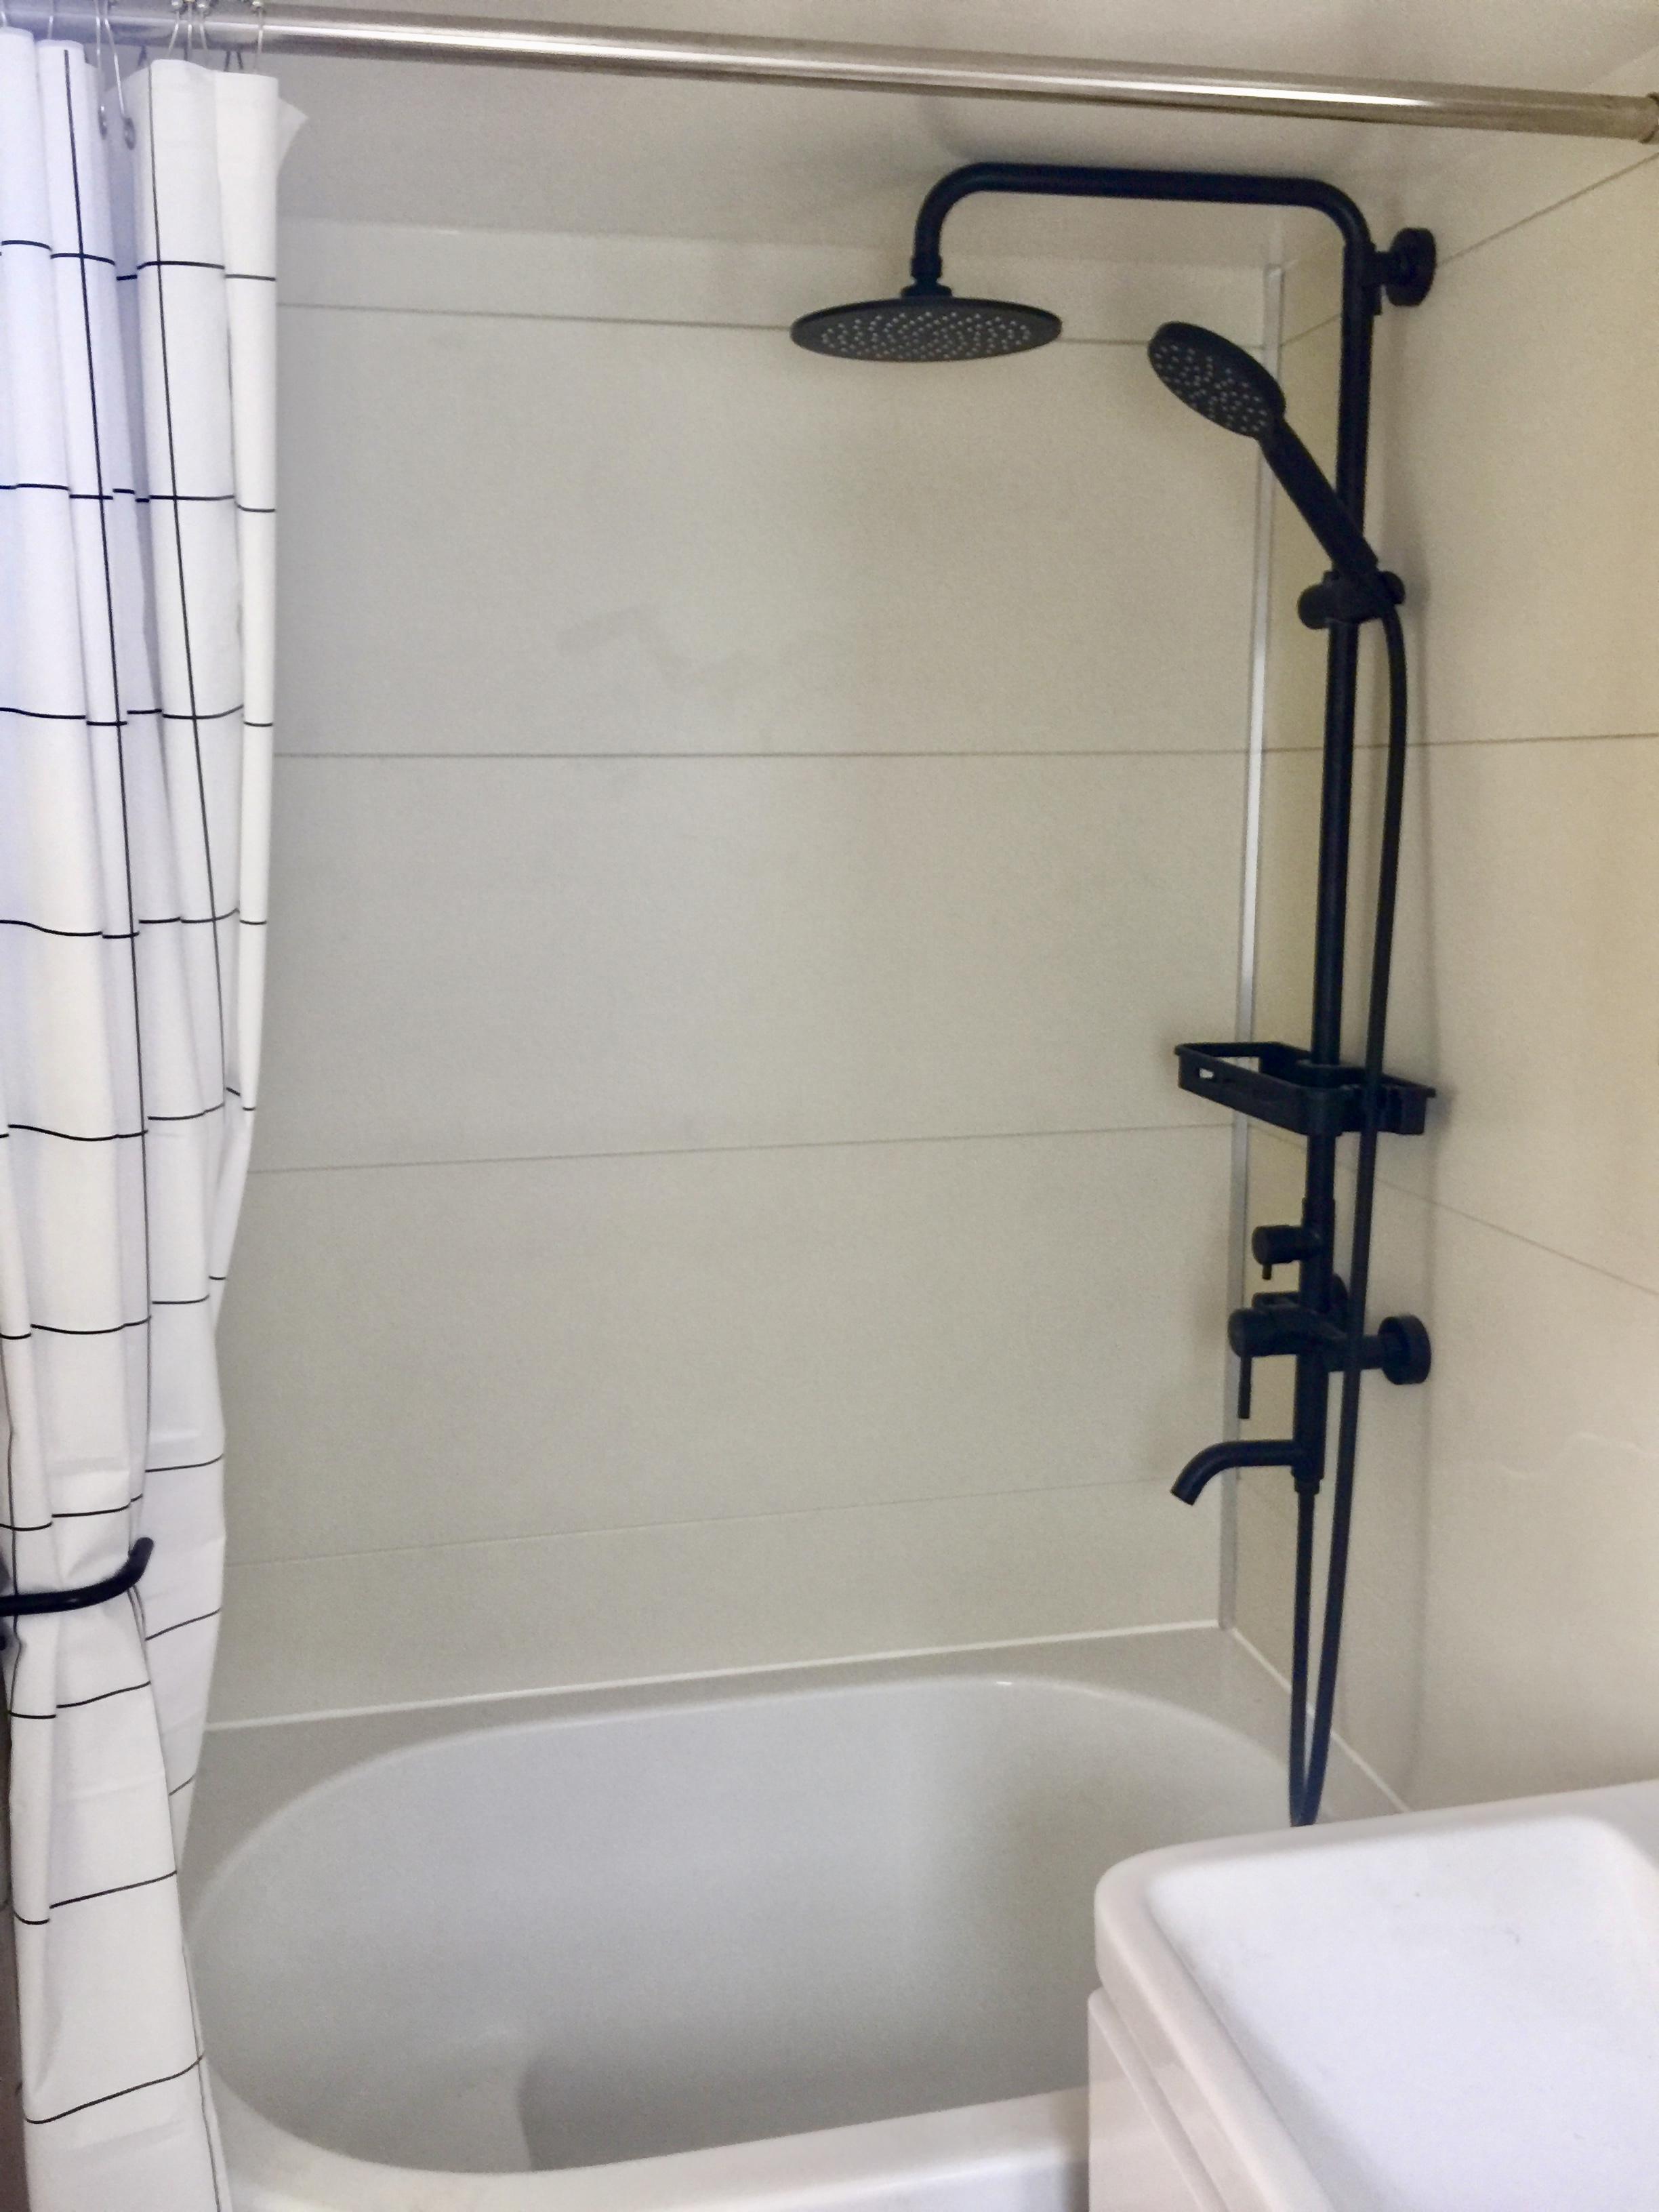 Bathroom with a shub